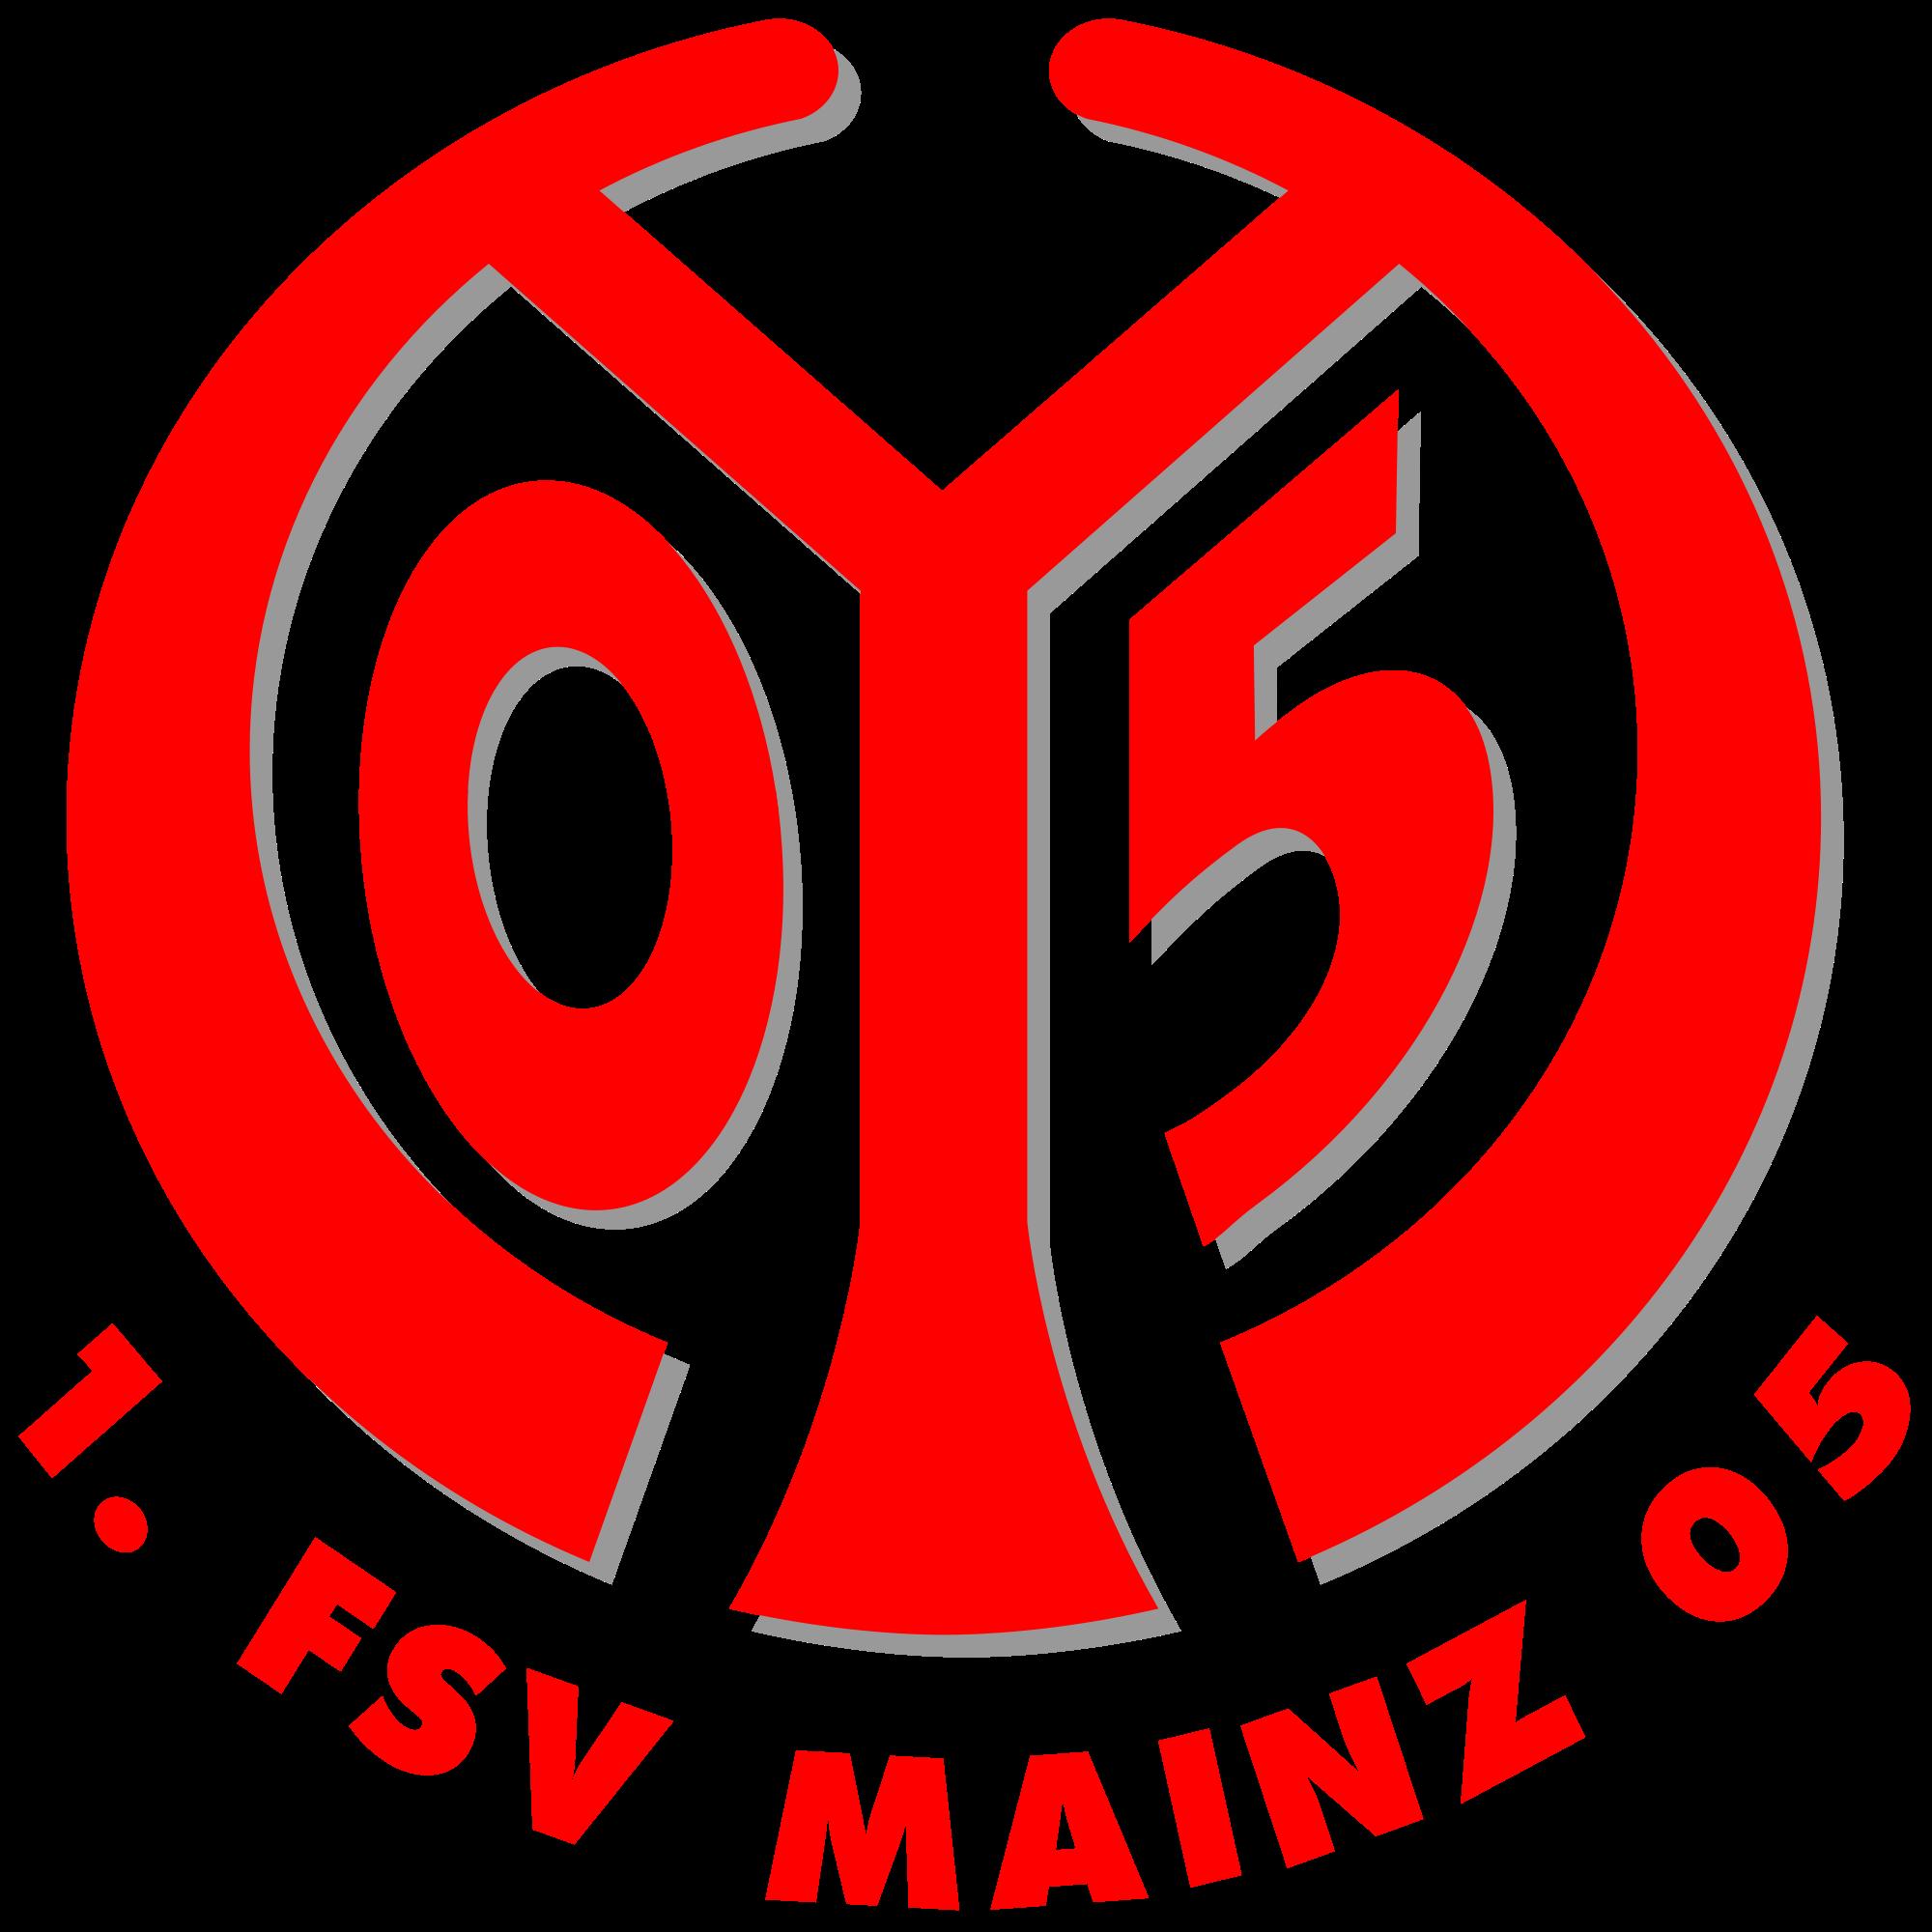 Der 1. FSV Mainz 05 kommt am 01.11. nach Jena!